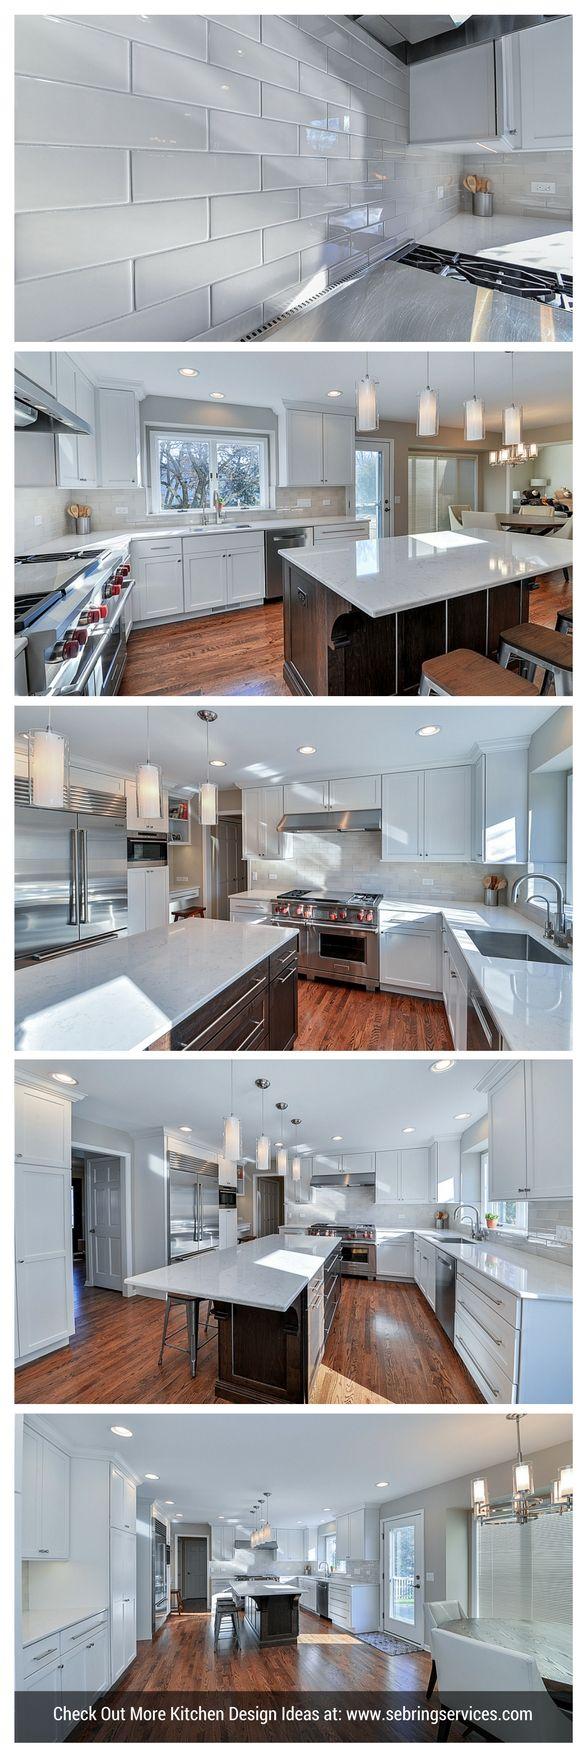 117 best Kitchens: Hutch Cabinets images on Pinterest | Kitchen ...